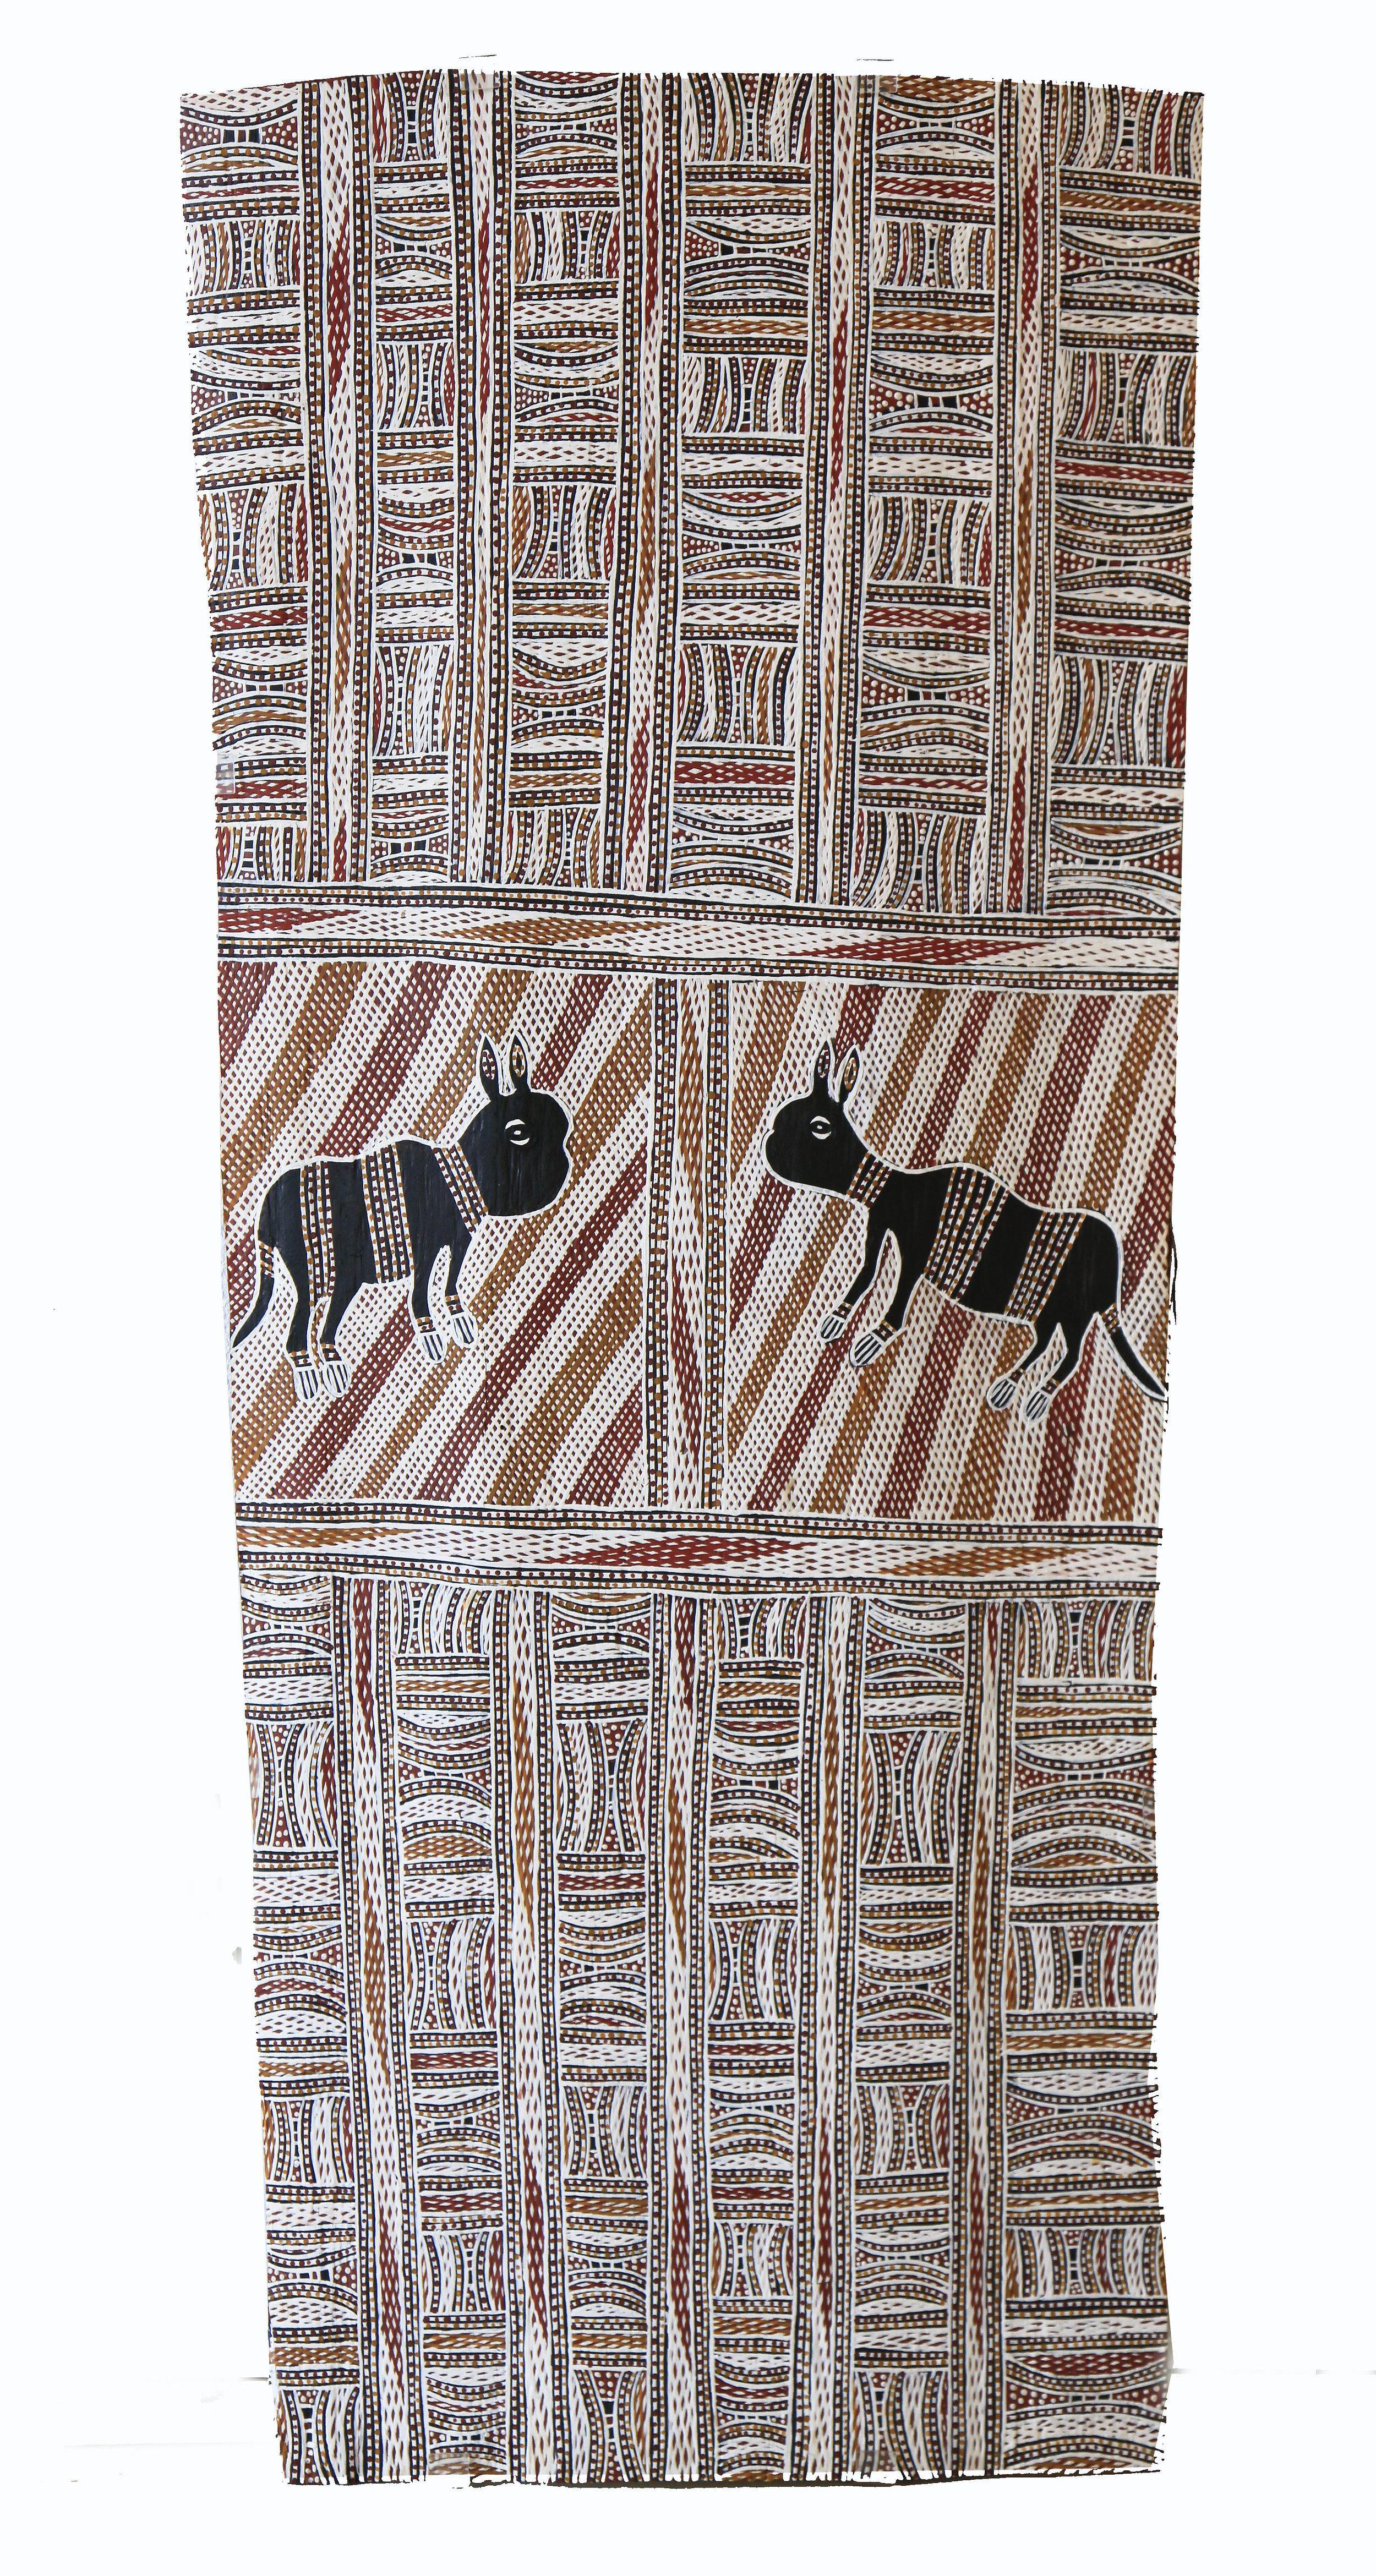 Wolpa Wanambi  Untitled  Natural earth pigments on bark 104 x 43cm  Buku Larrnggay Mulka #3381S   EMAIL INQUIRY